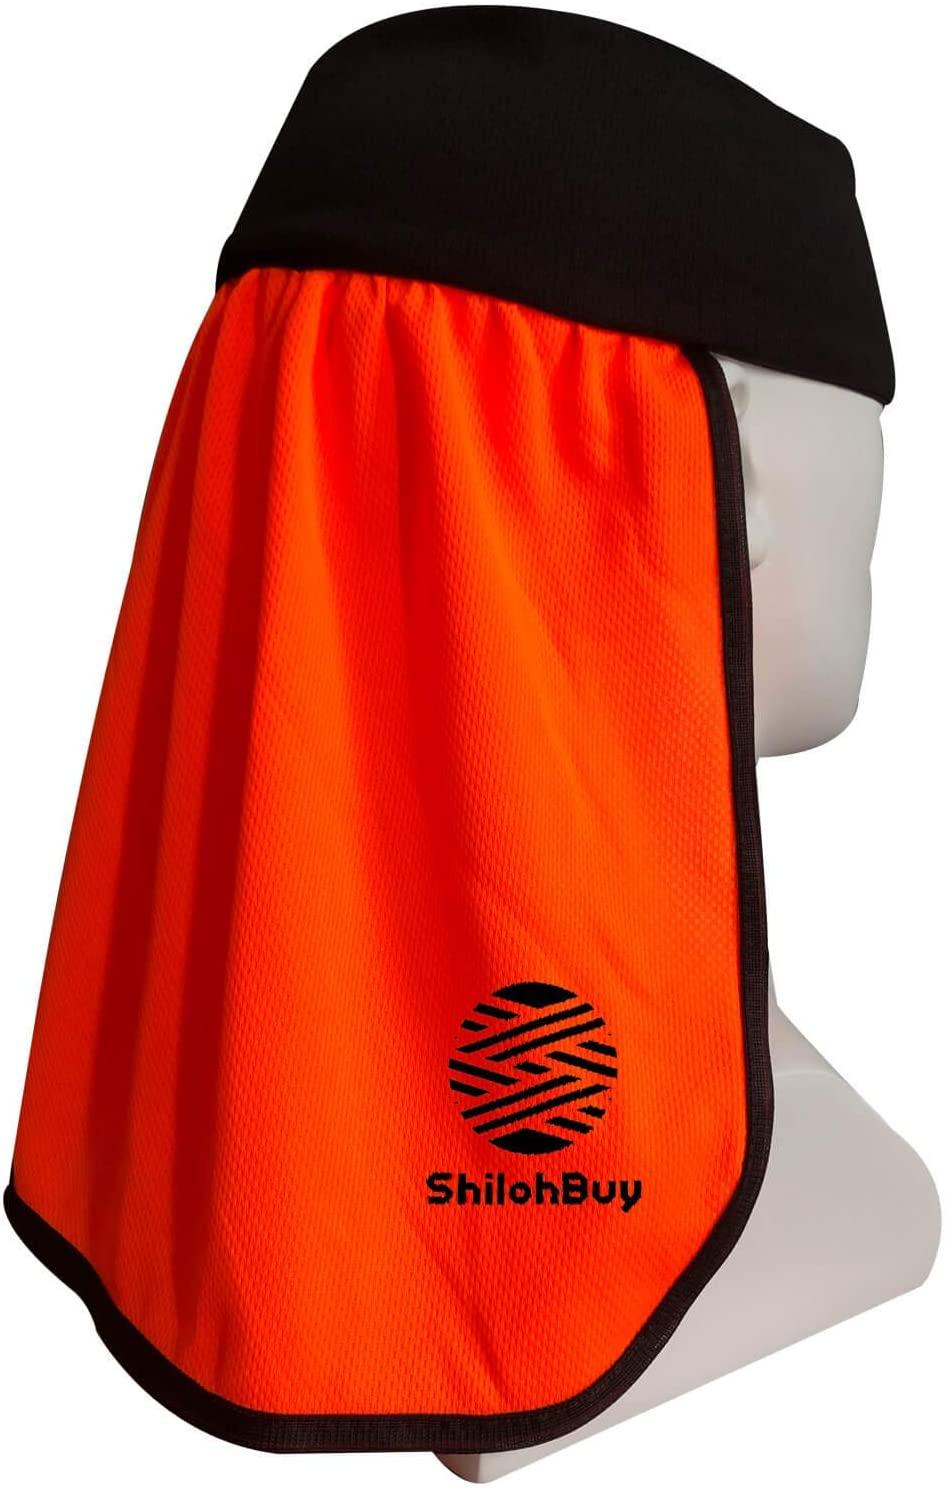 ShilohBuy - Hard Hat Sun Shade And Sweatband Liner, Neck Shade, Sun Shield For Safety Hard Hat Accessories, Neon Orange